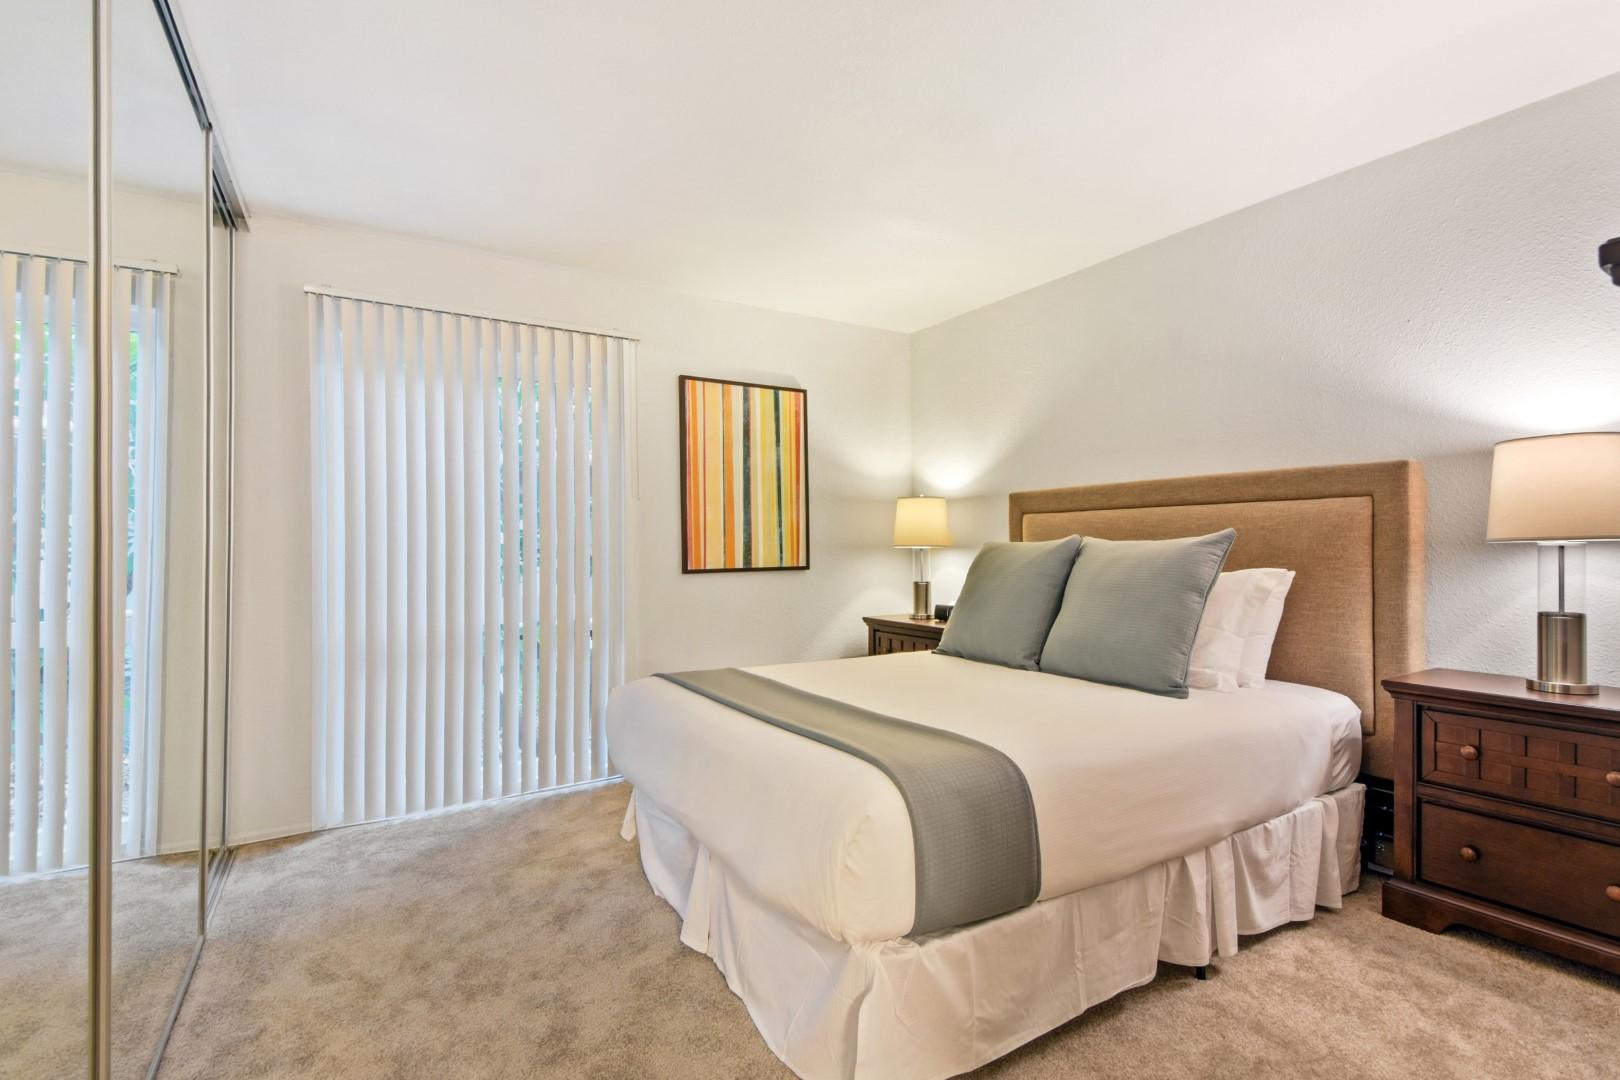 Bed at Ava Toluca Hills Apartments, Toluca Lake, Los Angeles